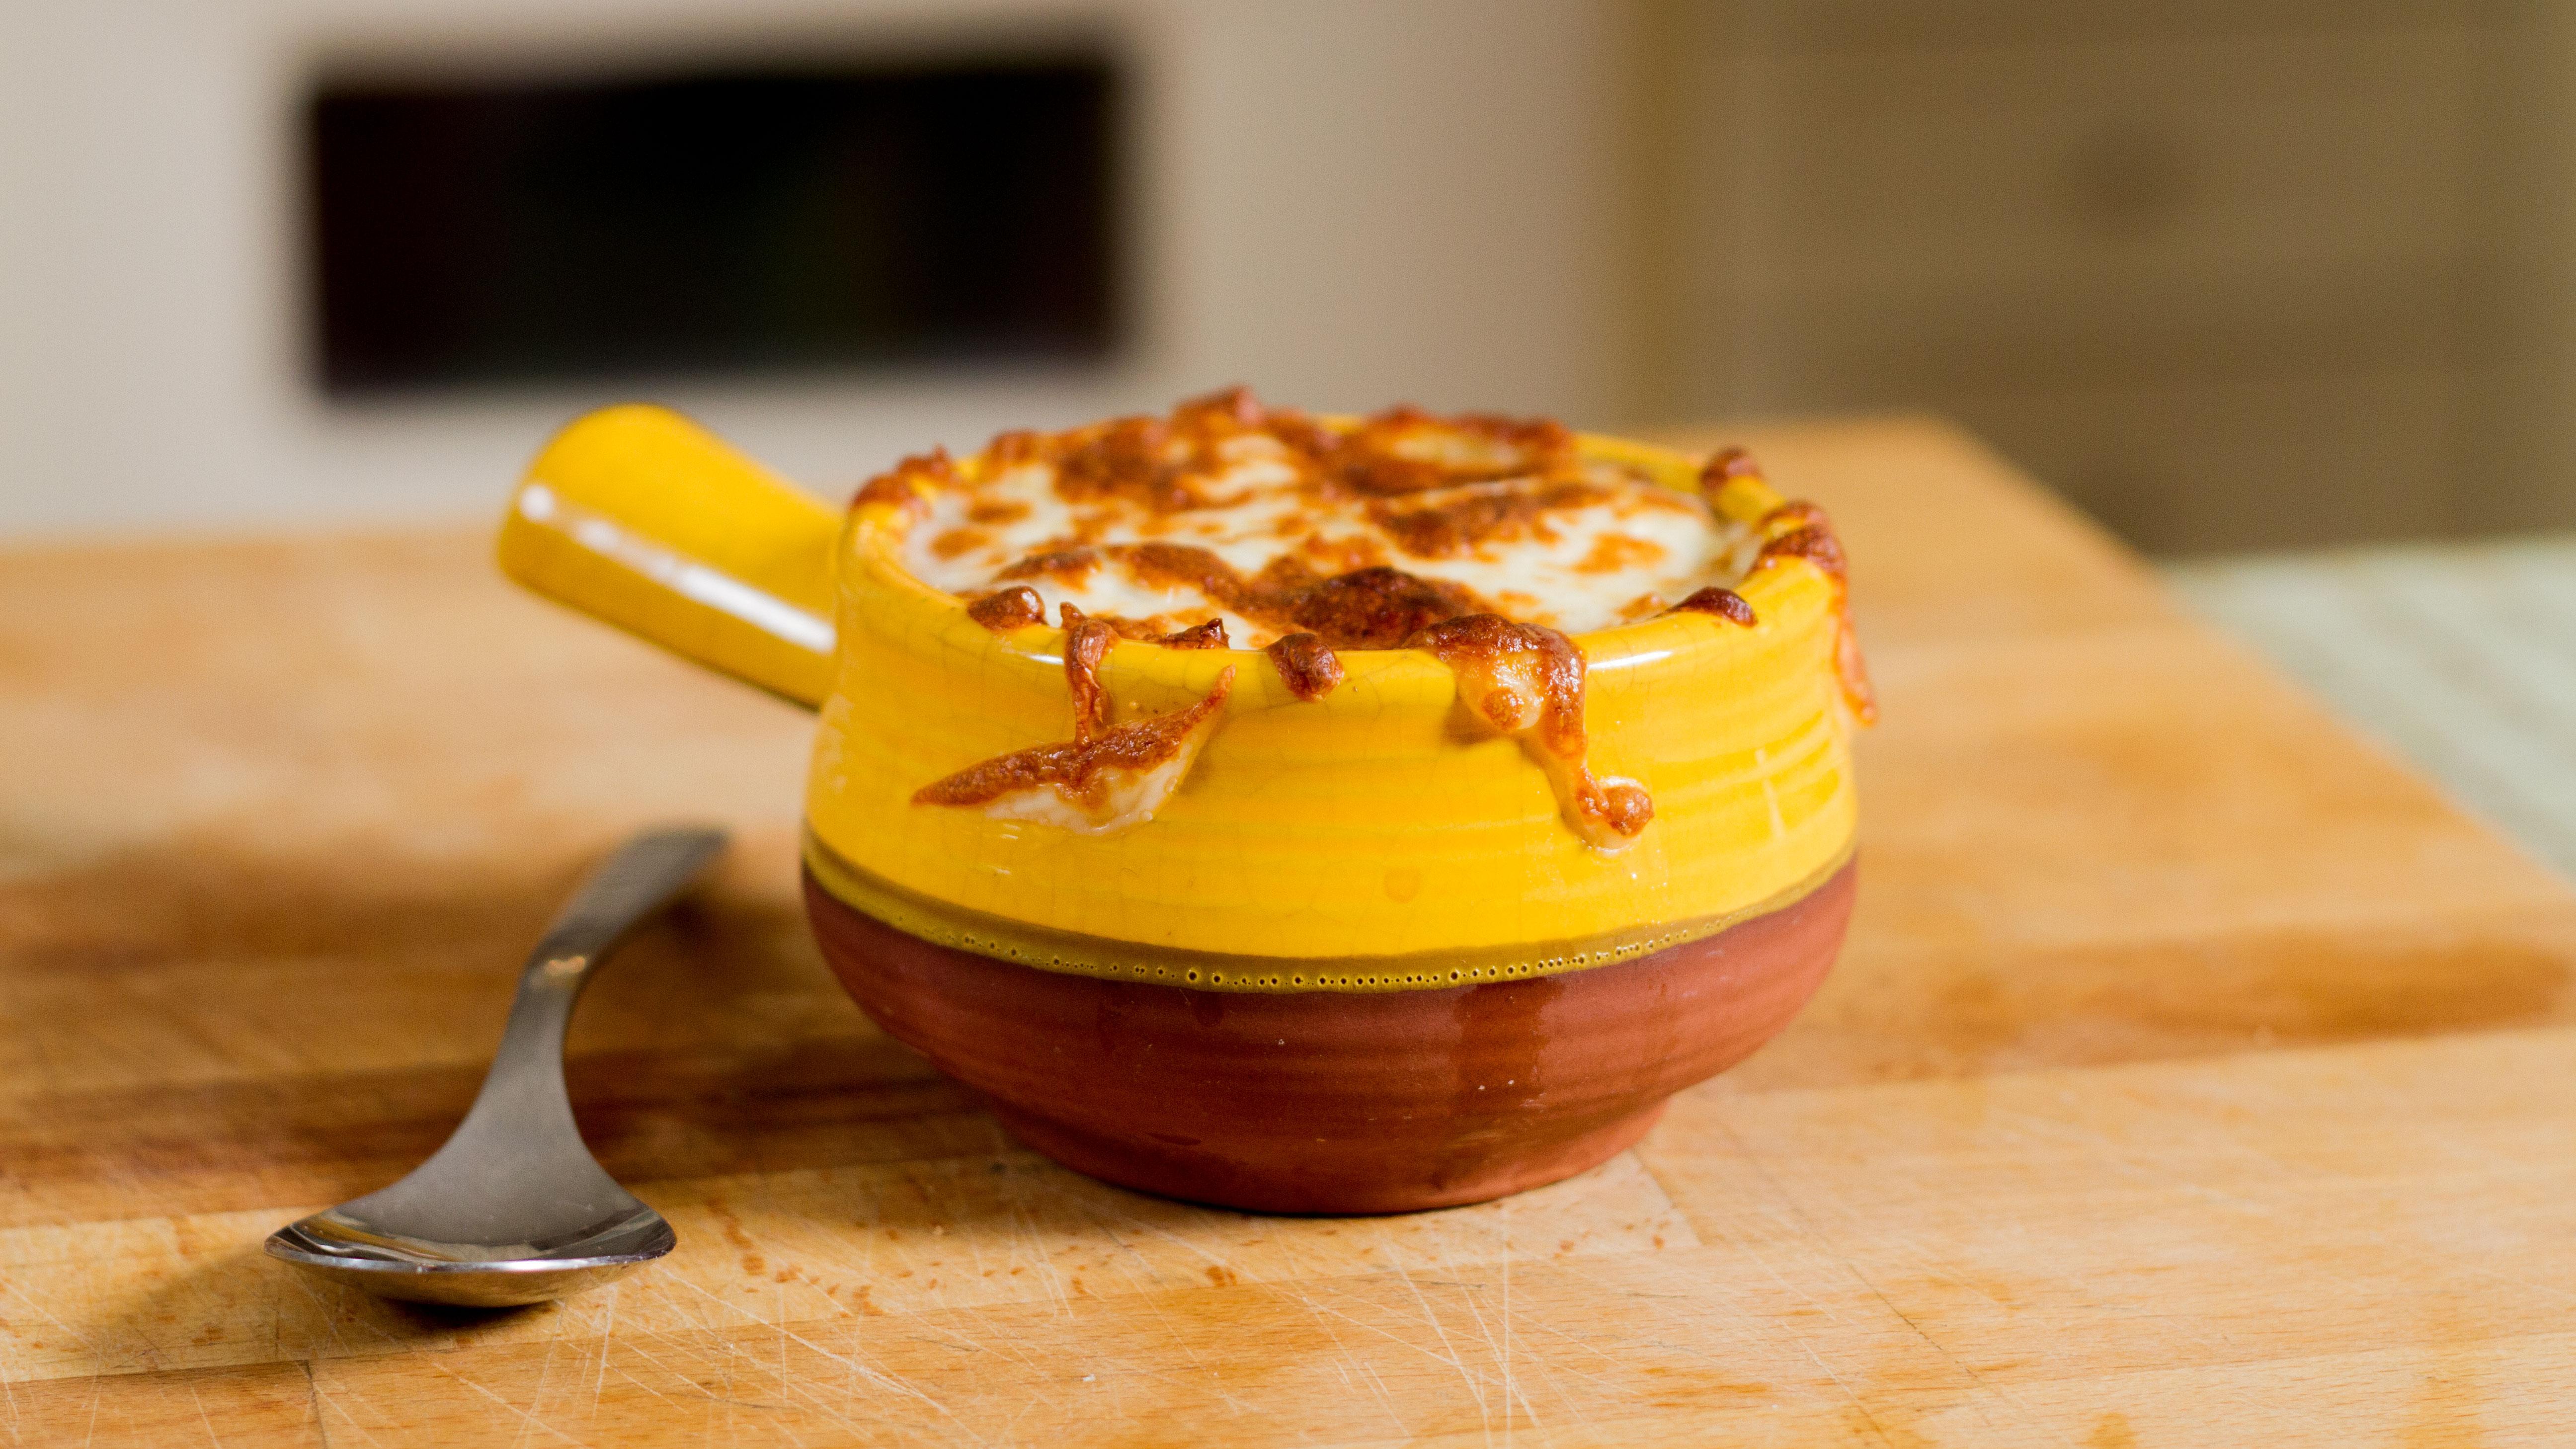 bob-le-chef-soupe-oignon-fromage-cheddar-ile-aux-grues-quebec